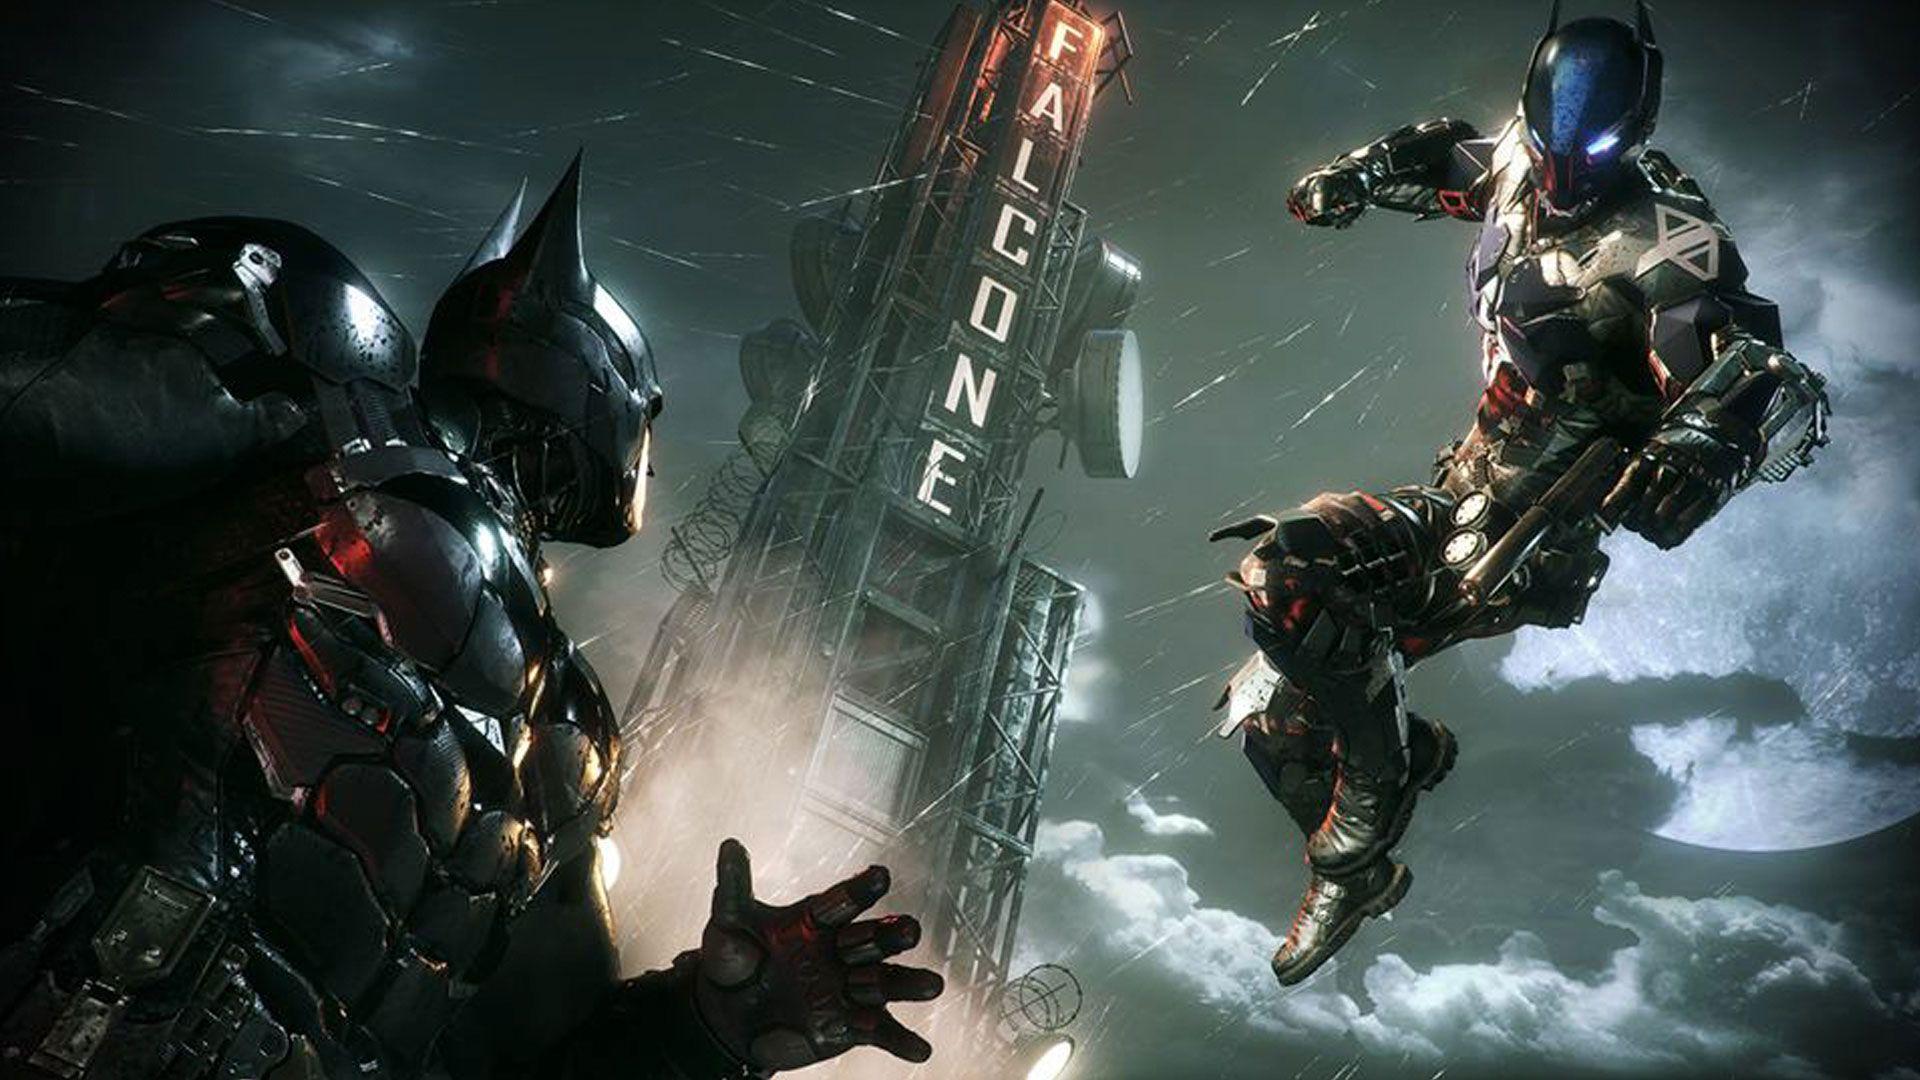 Arkham Knight Vs Batman - Batman Arkham Knight #BatmanArkhamKnight #BatmanArkham #ArkhamKnight #Batman